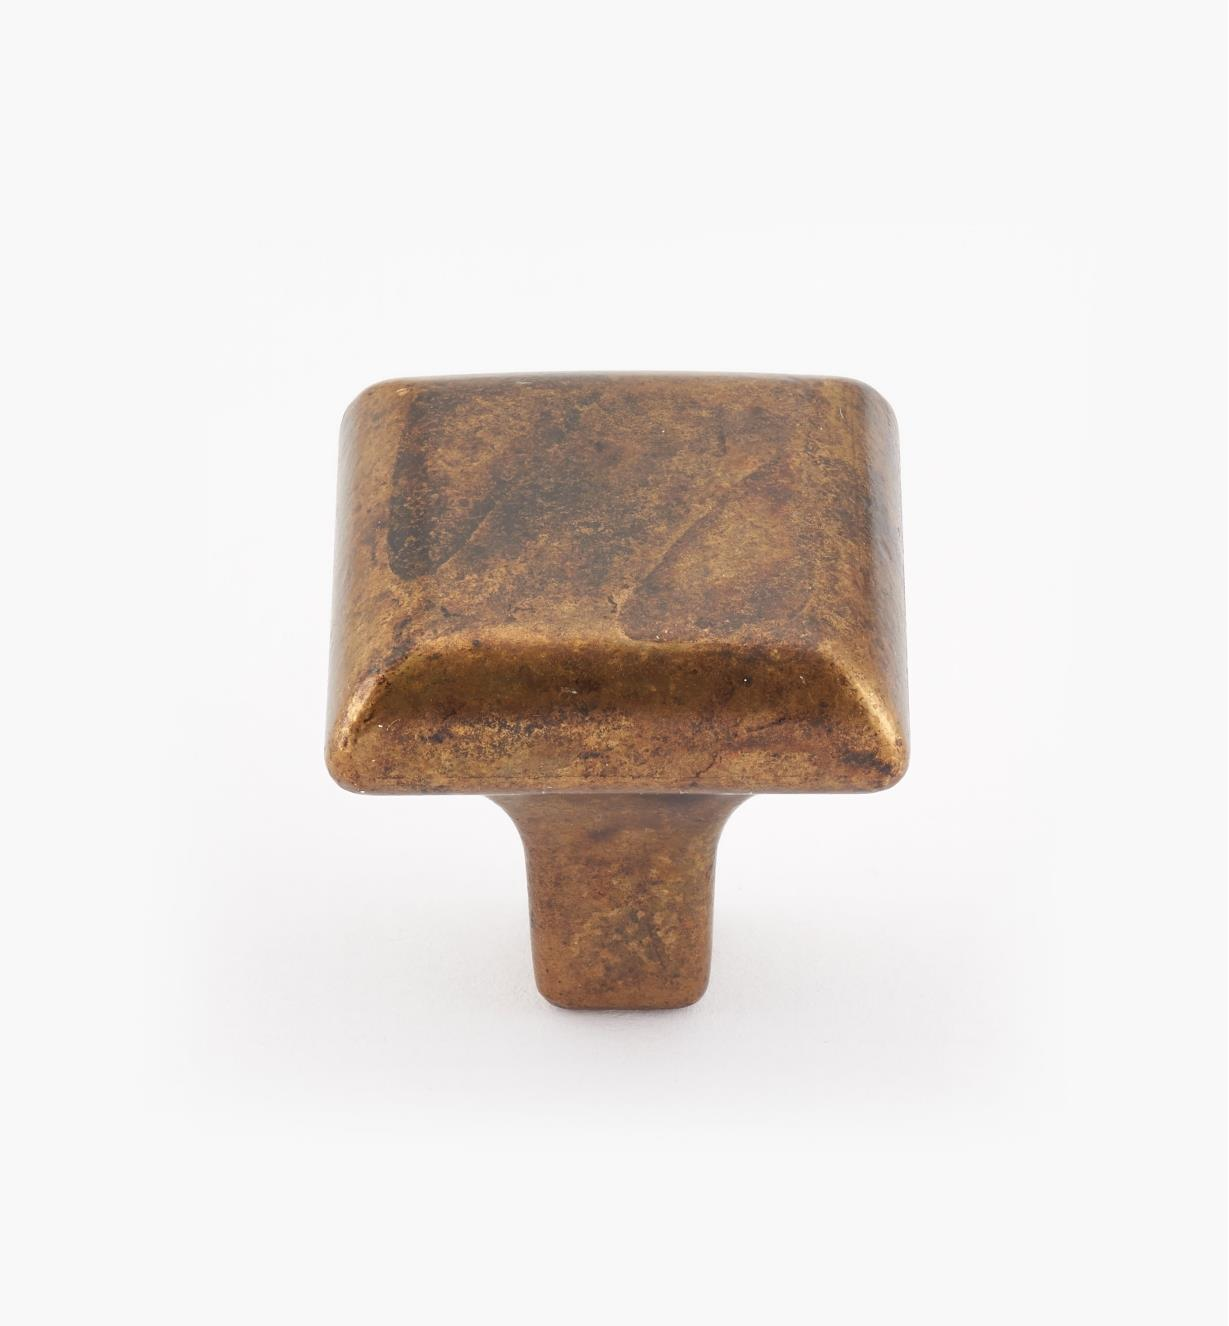 01X4005 - Old Brass Classic Square Knob